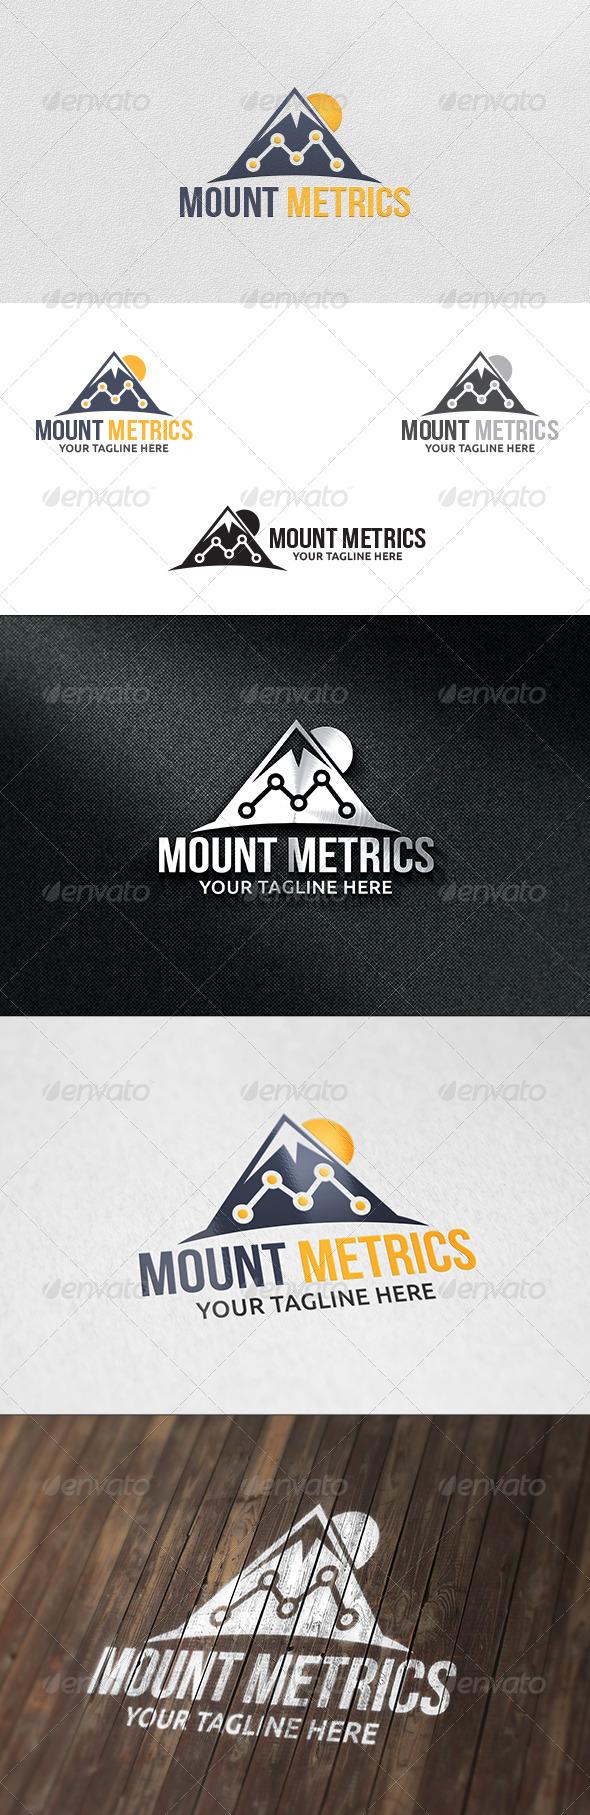 GraphicRiver Mountain Metrics Logo Template 6199134